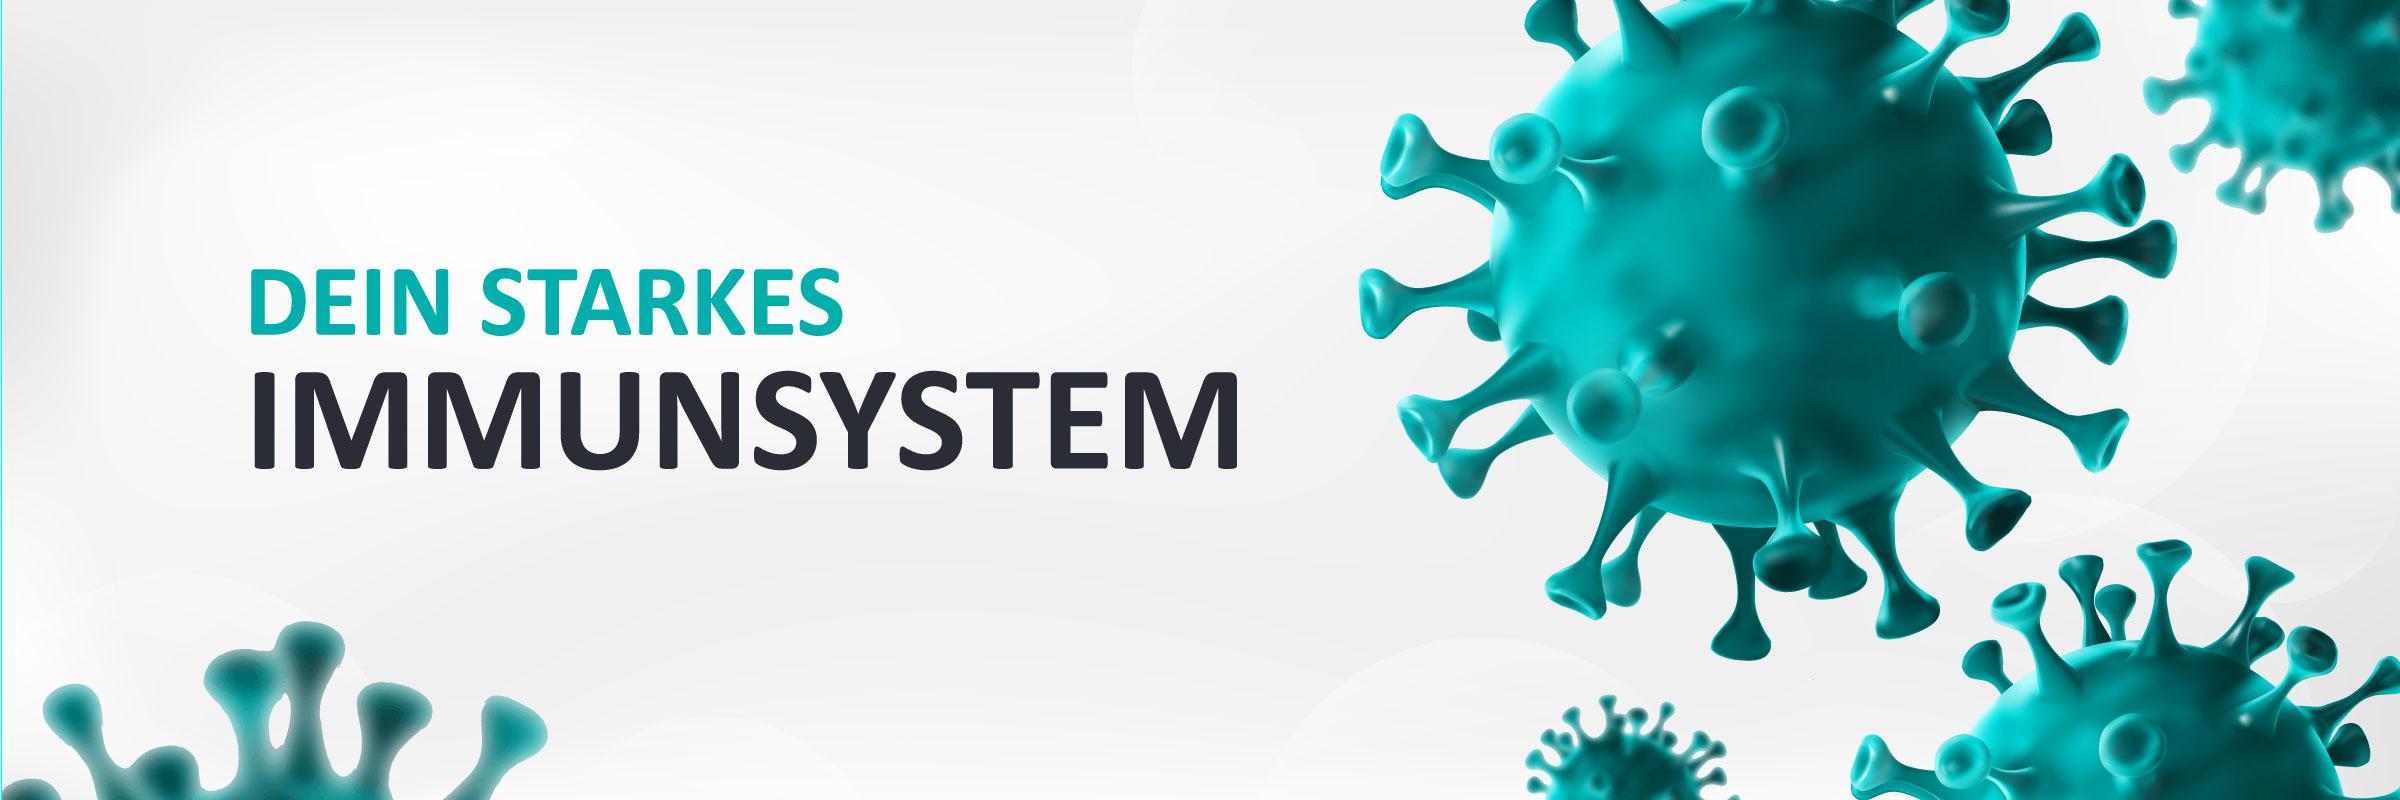 Dein starkes Immunsystem Coverbild